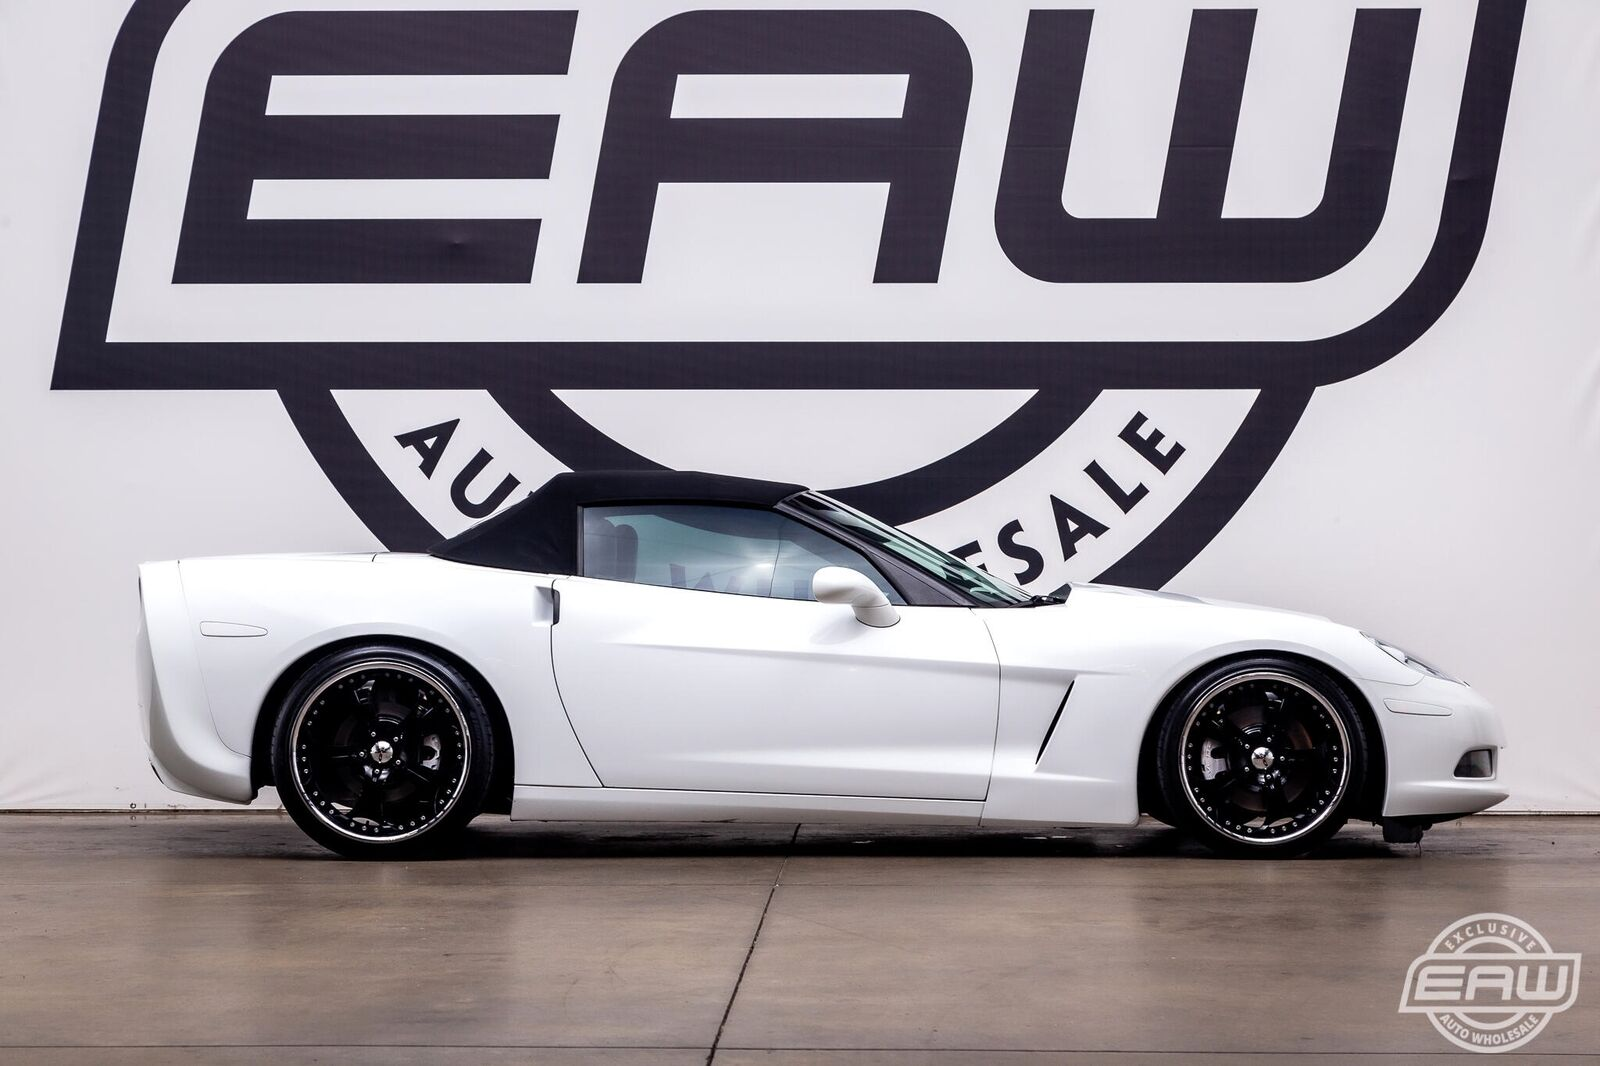 2005 White Chevrolet Corvette Convertible    C6 Corvette Photo 9